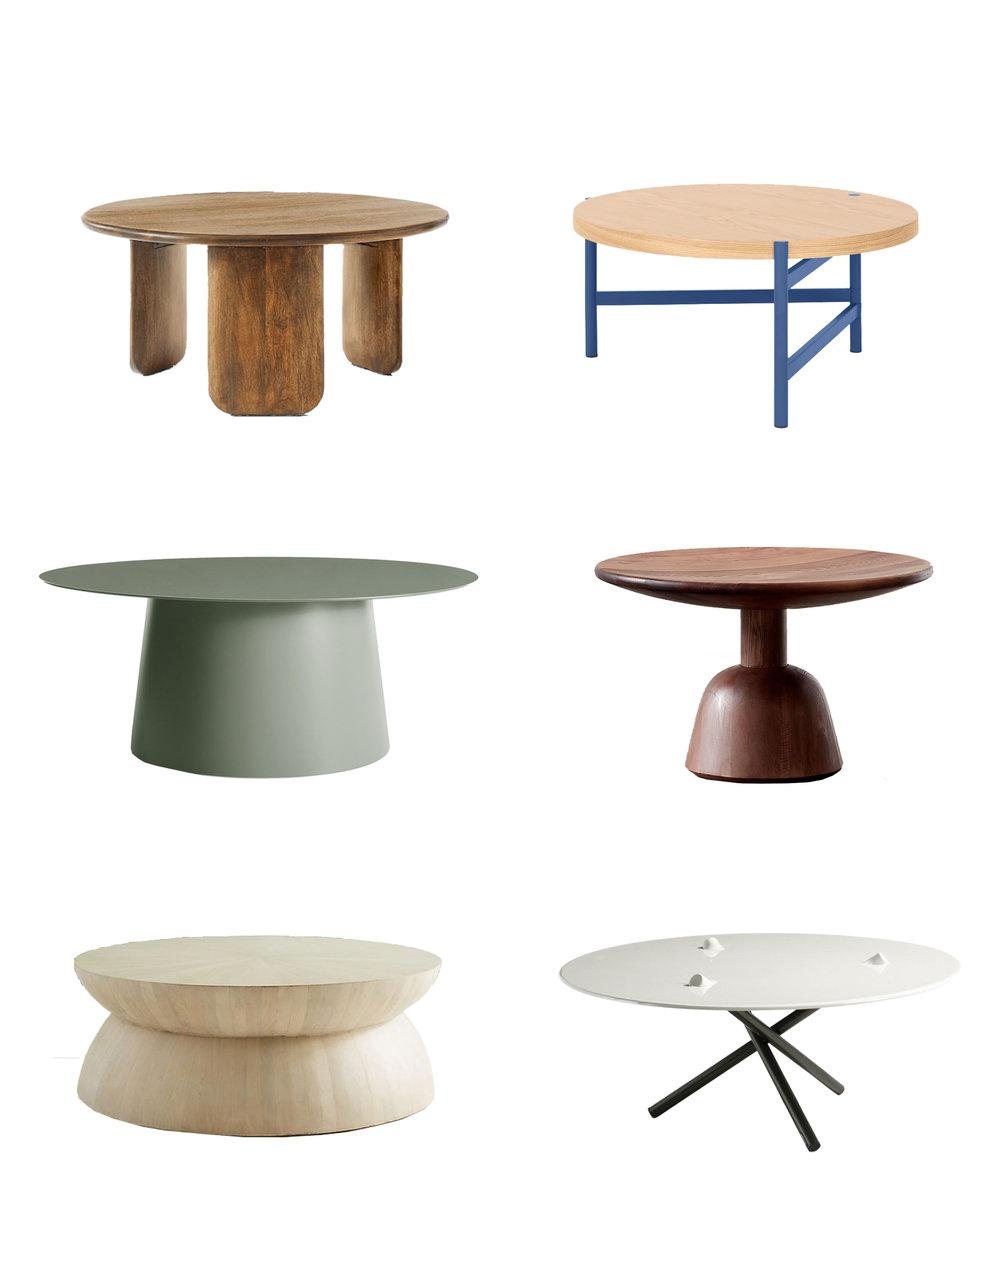 round coffee tables.jpg